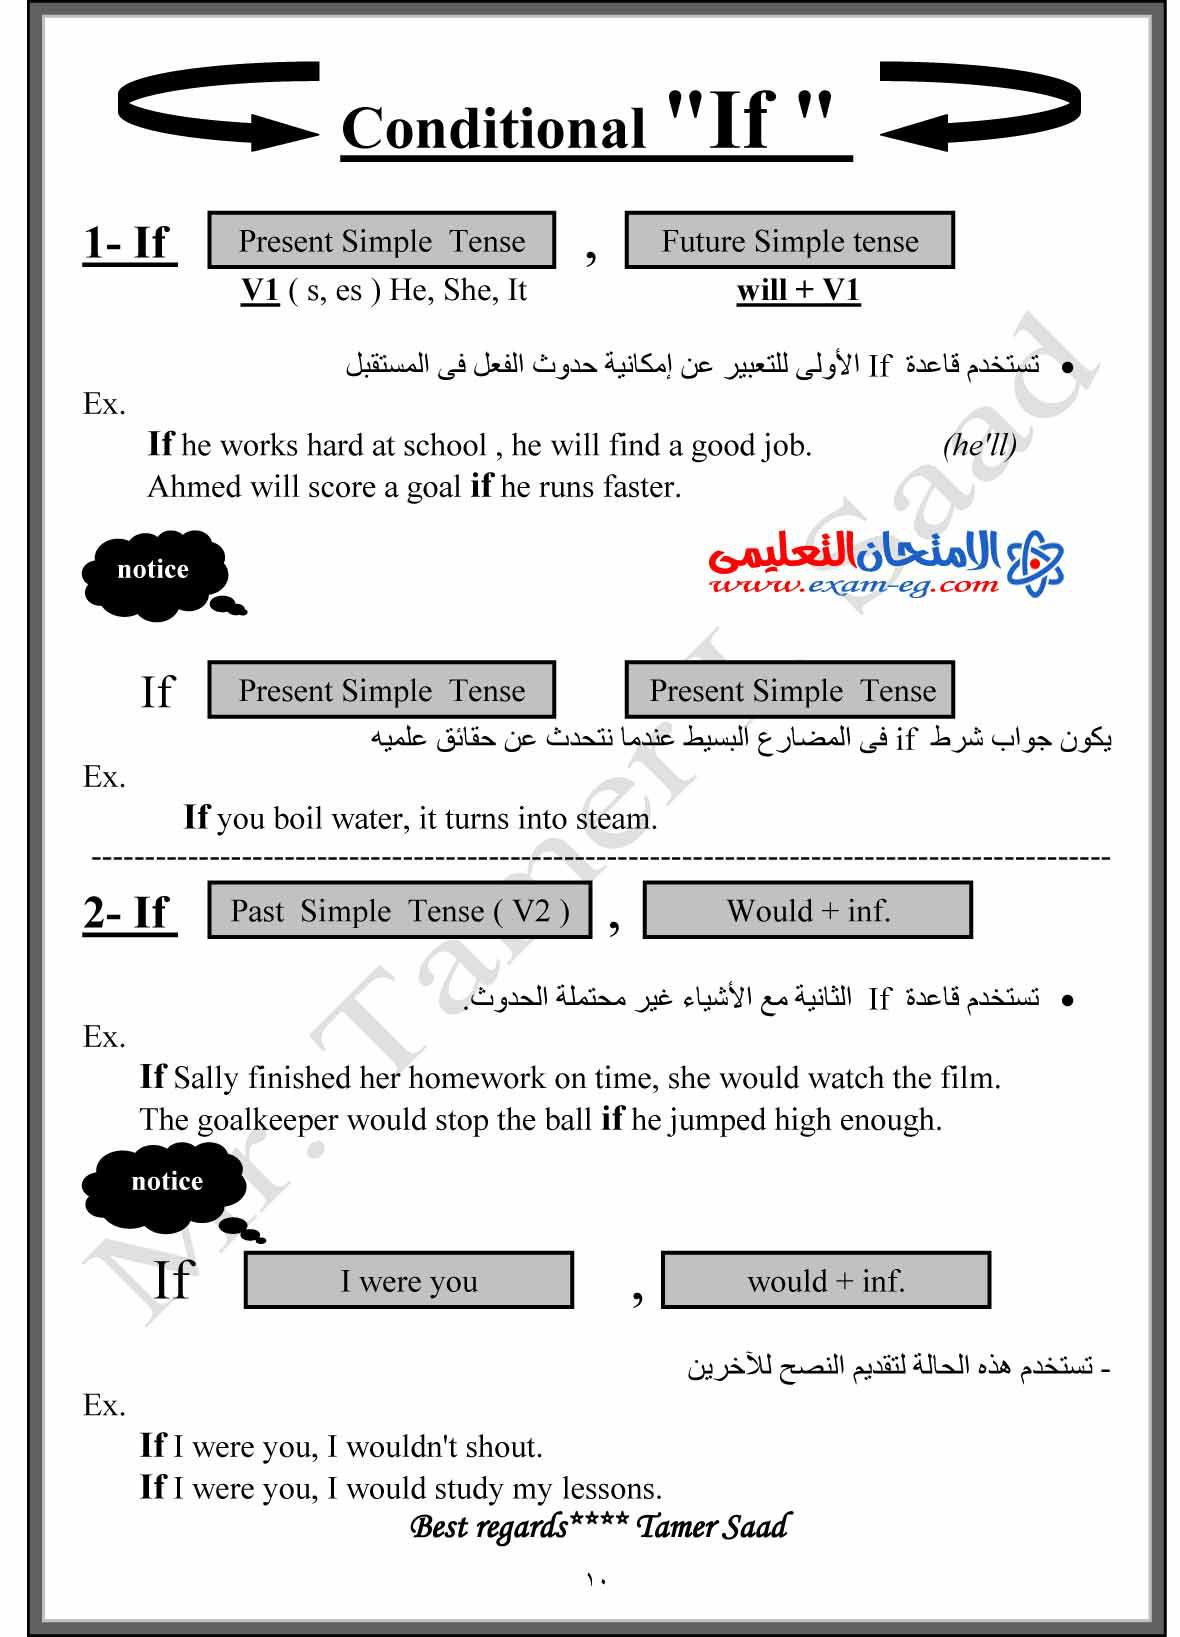 exam-eg.com_14428452400910.jpg